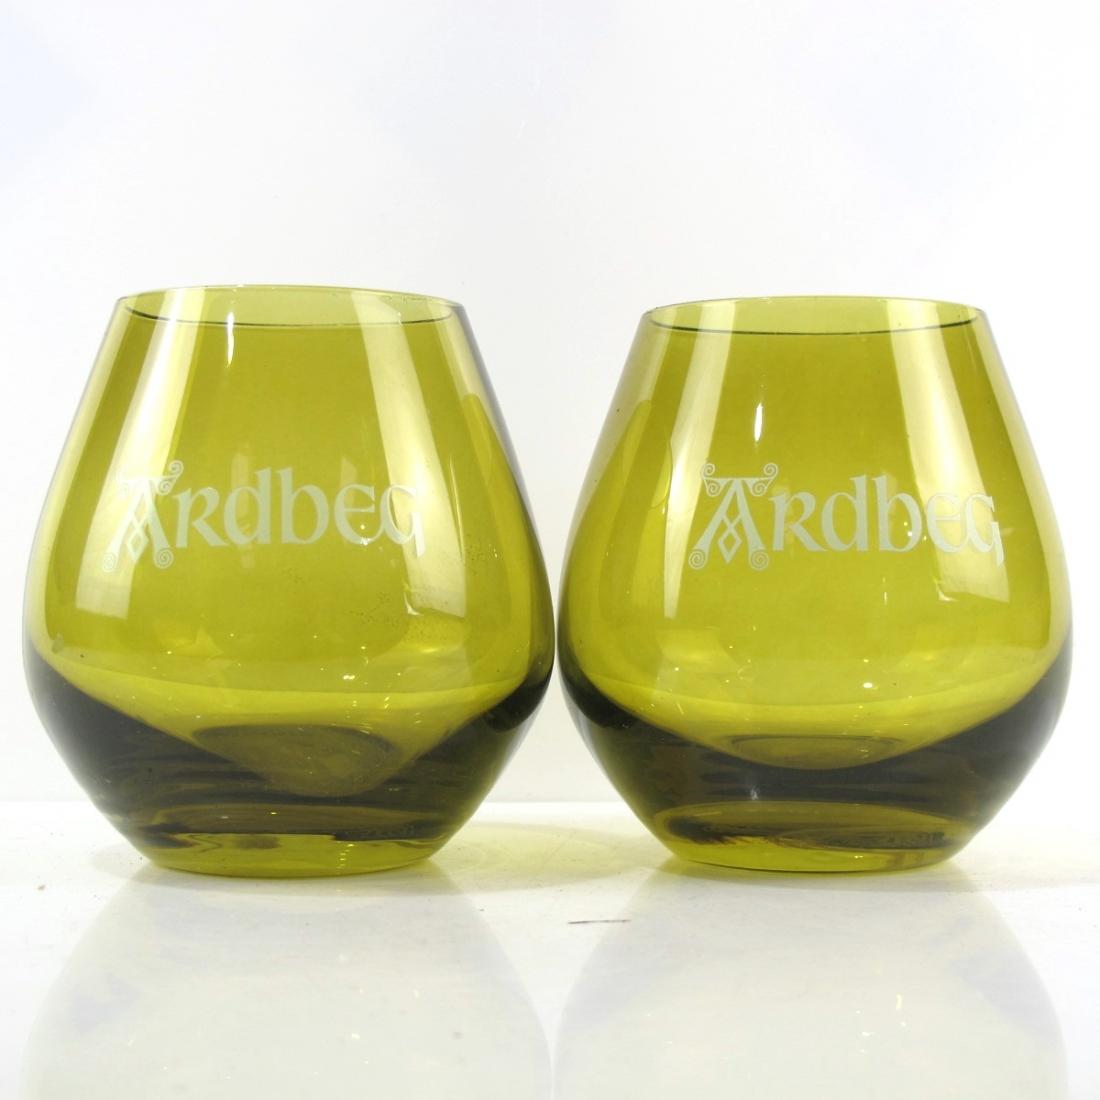 Ardbeg Cocktail Tumblers x 2